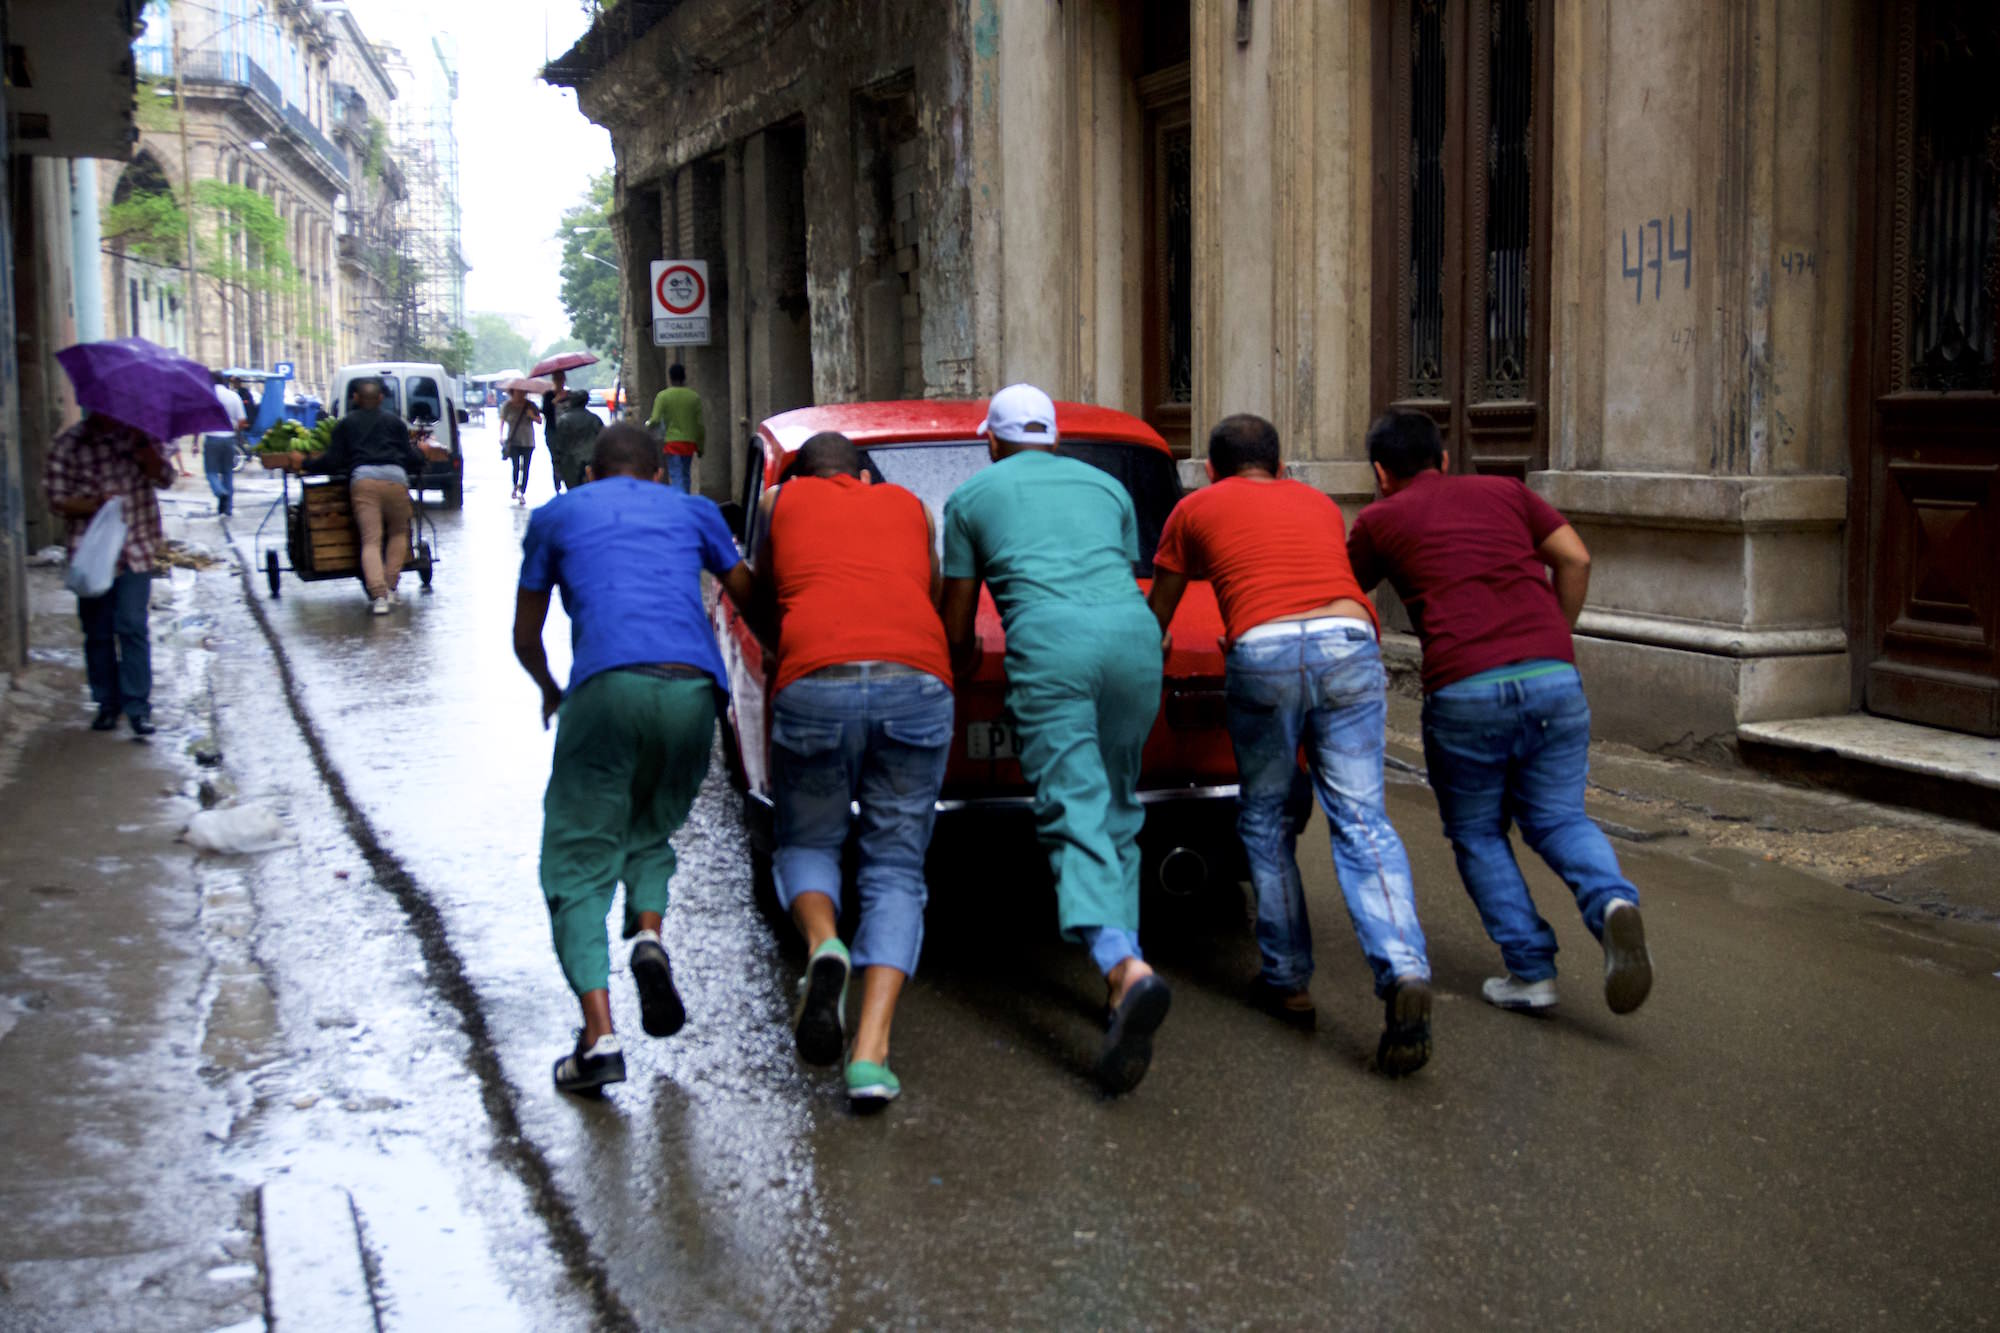 Men pushing a broken car in Havana. Daily life in Cuba.